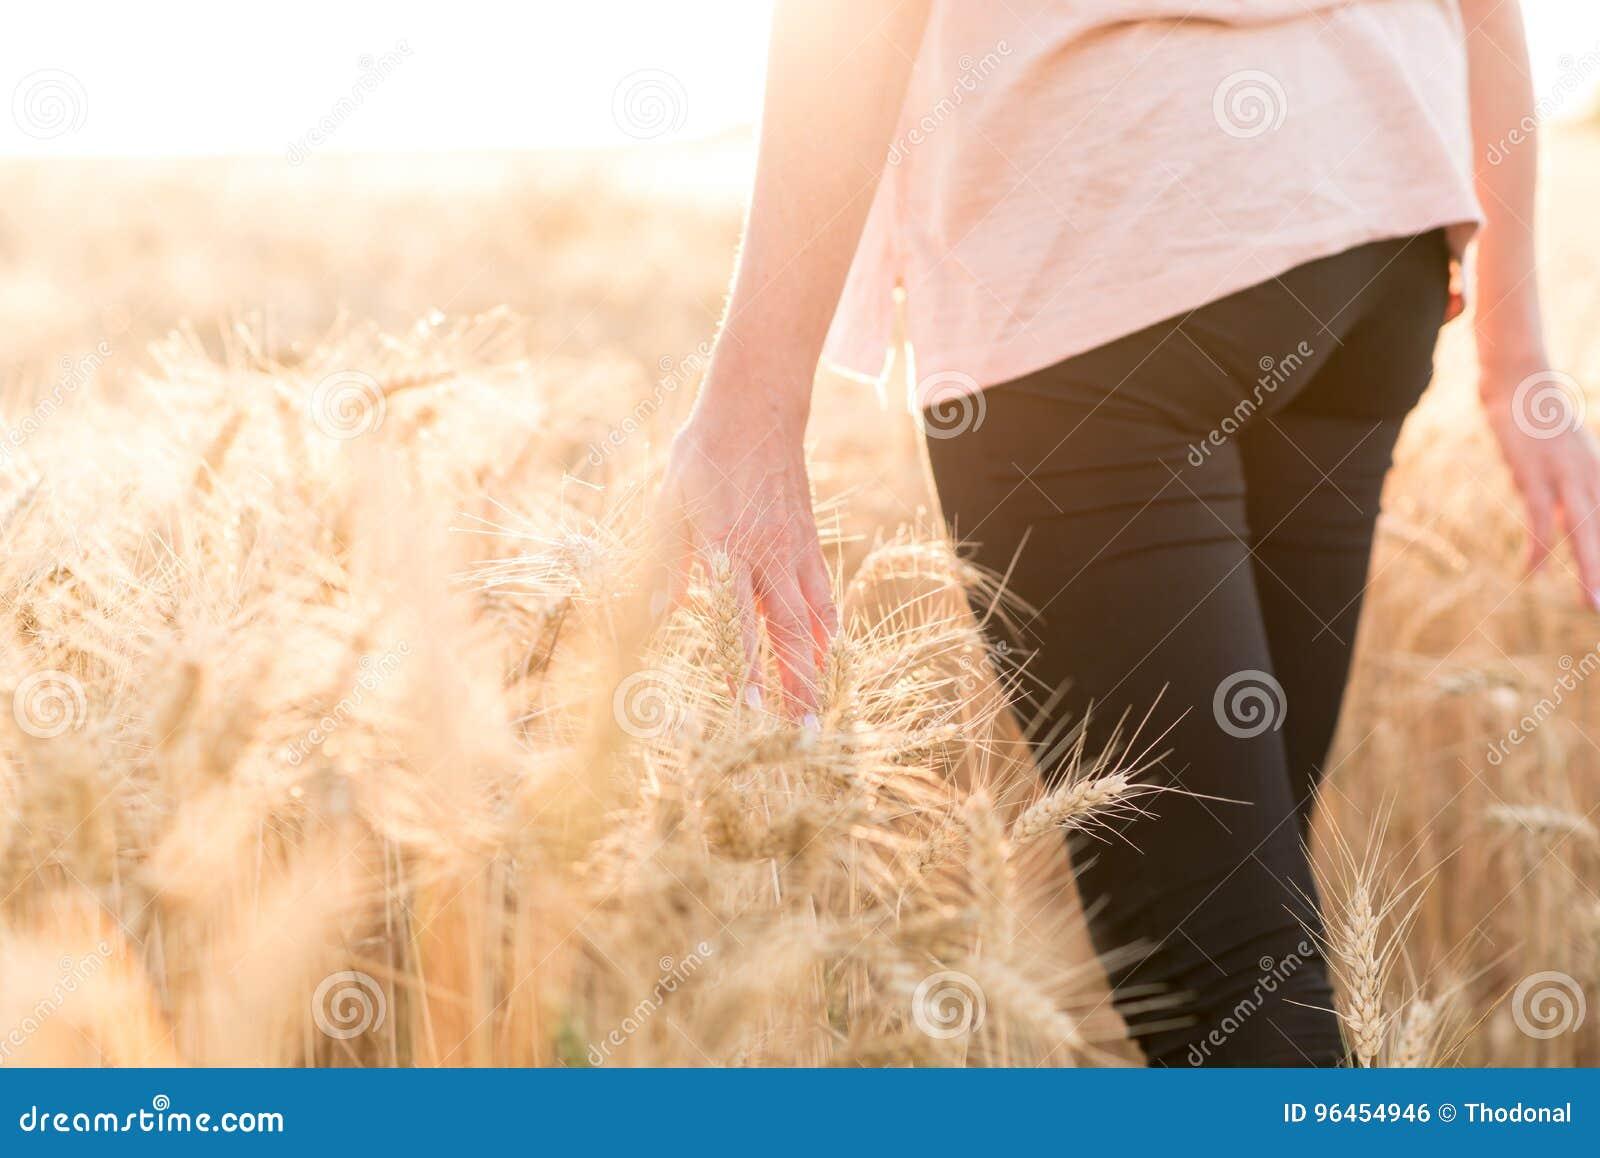 Woman walking and touching ears of wheat, sunlight effect